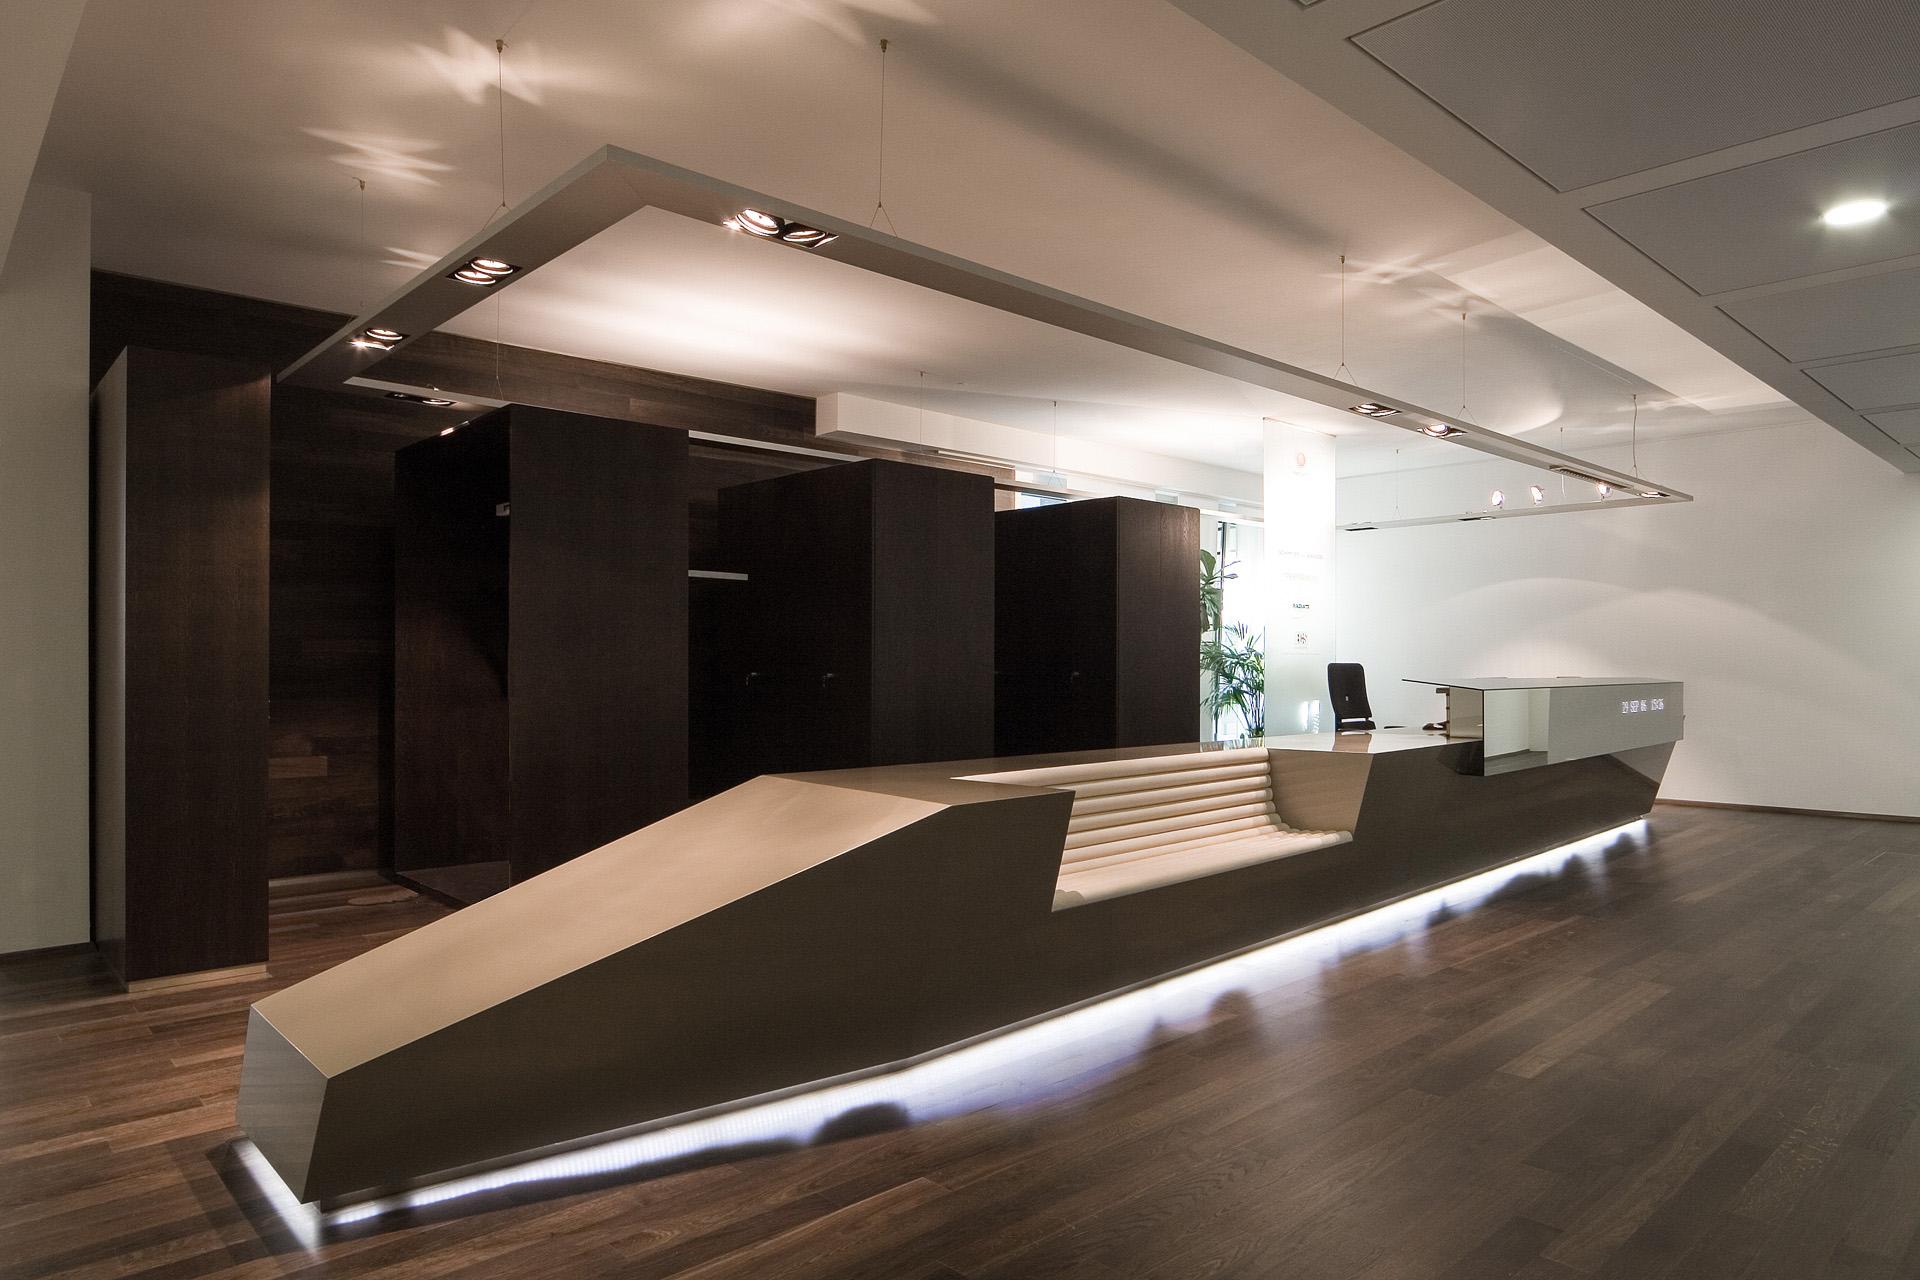 002-interior-design-office-auratis-ag-muenchen-buero-philipp-moeller.jpg